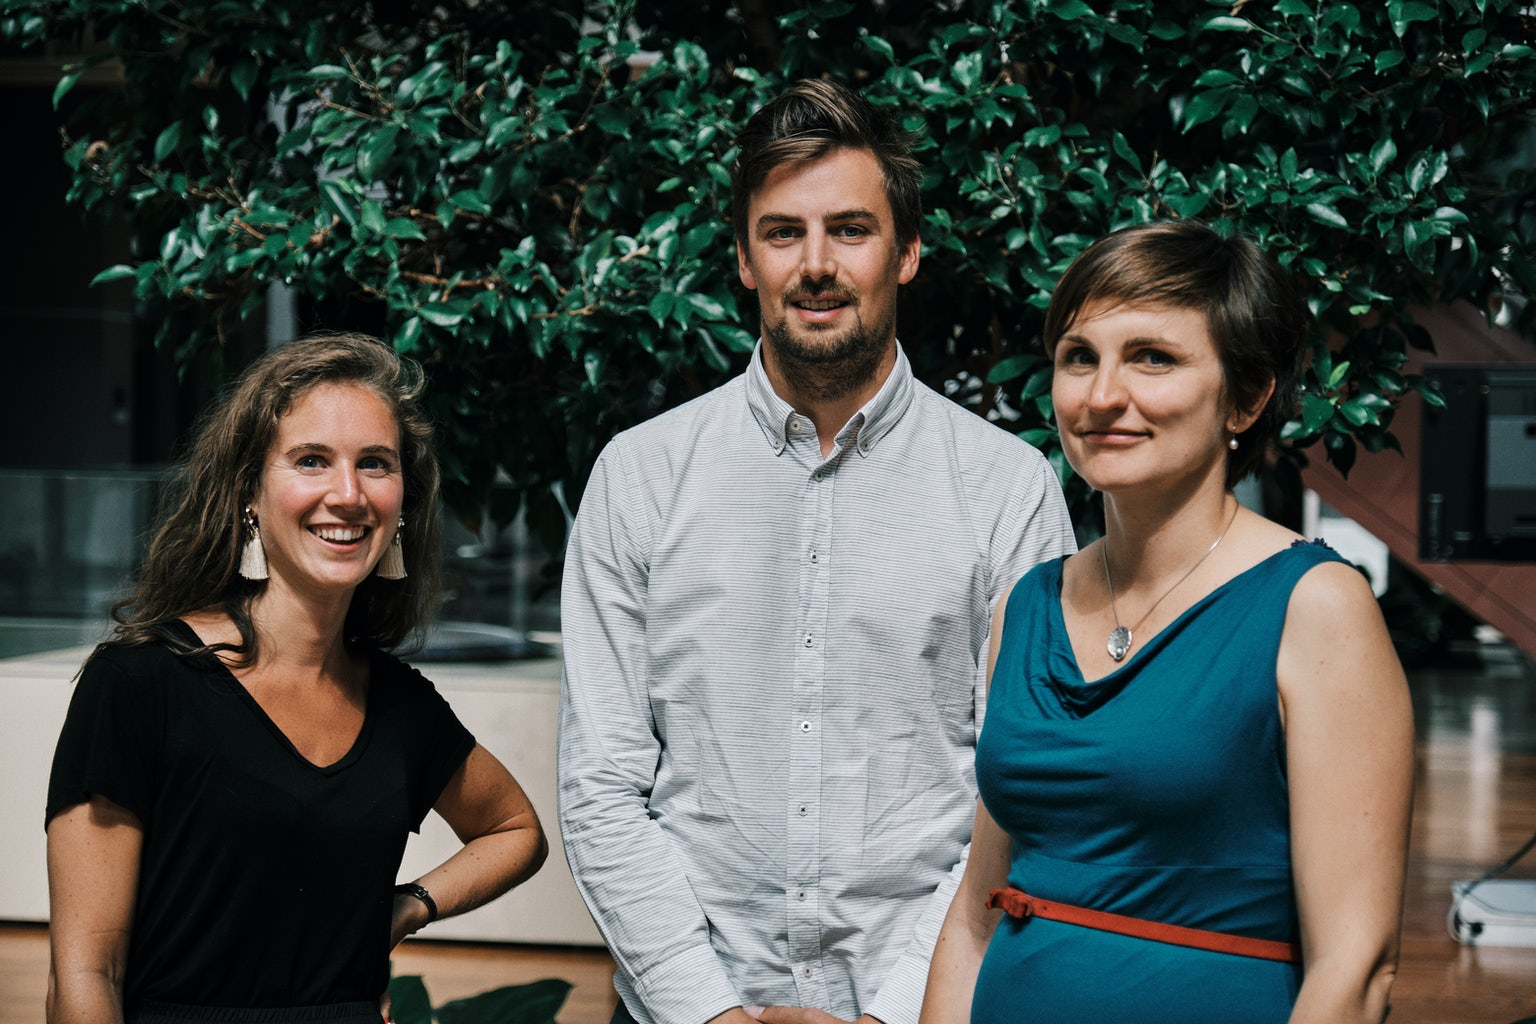 Ombudsdienst Genderkamer